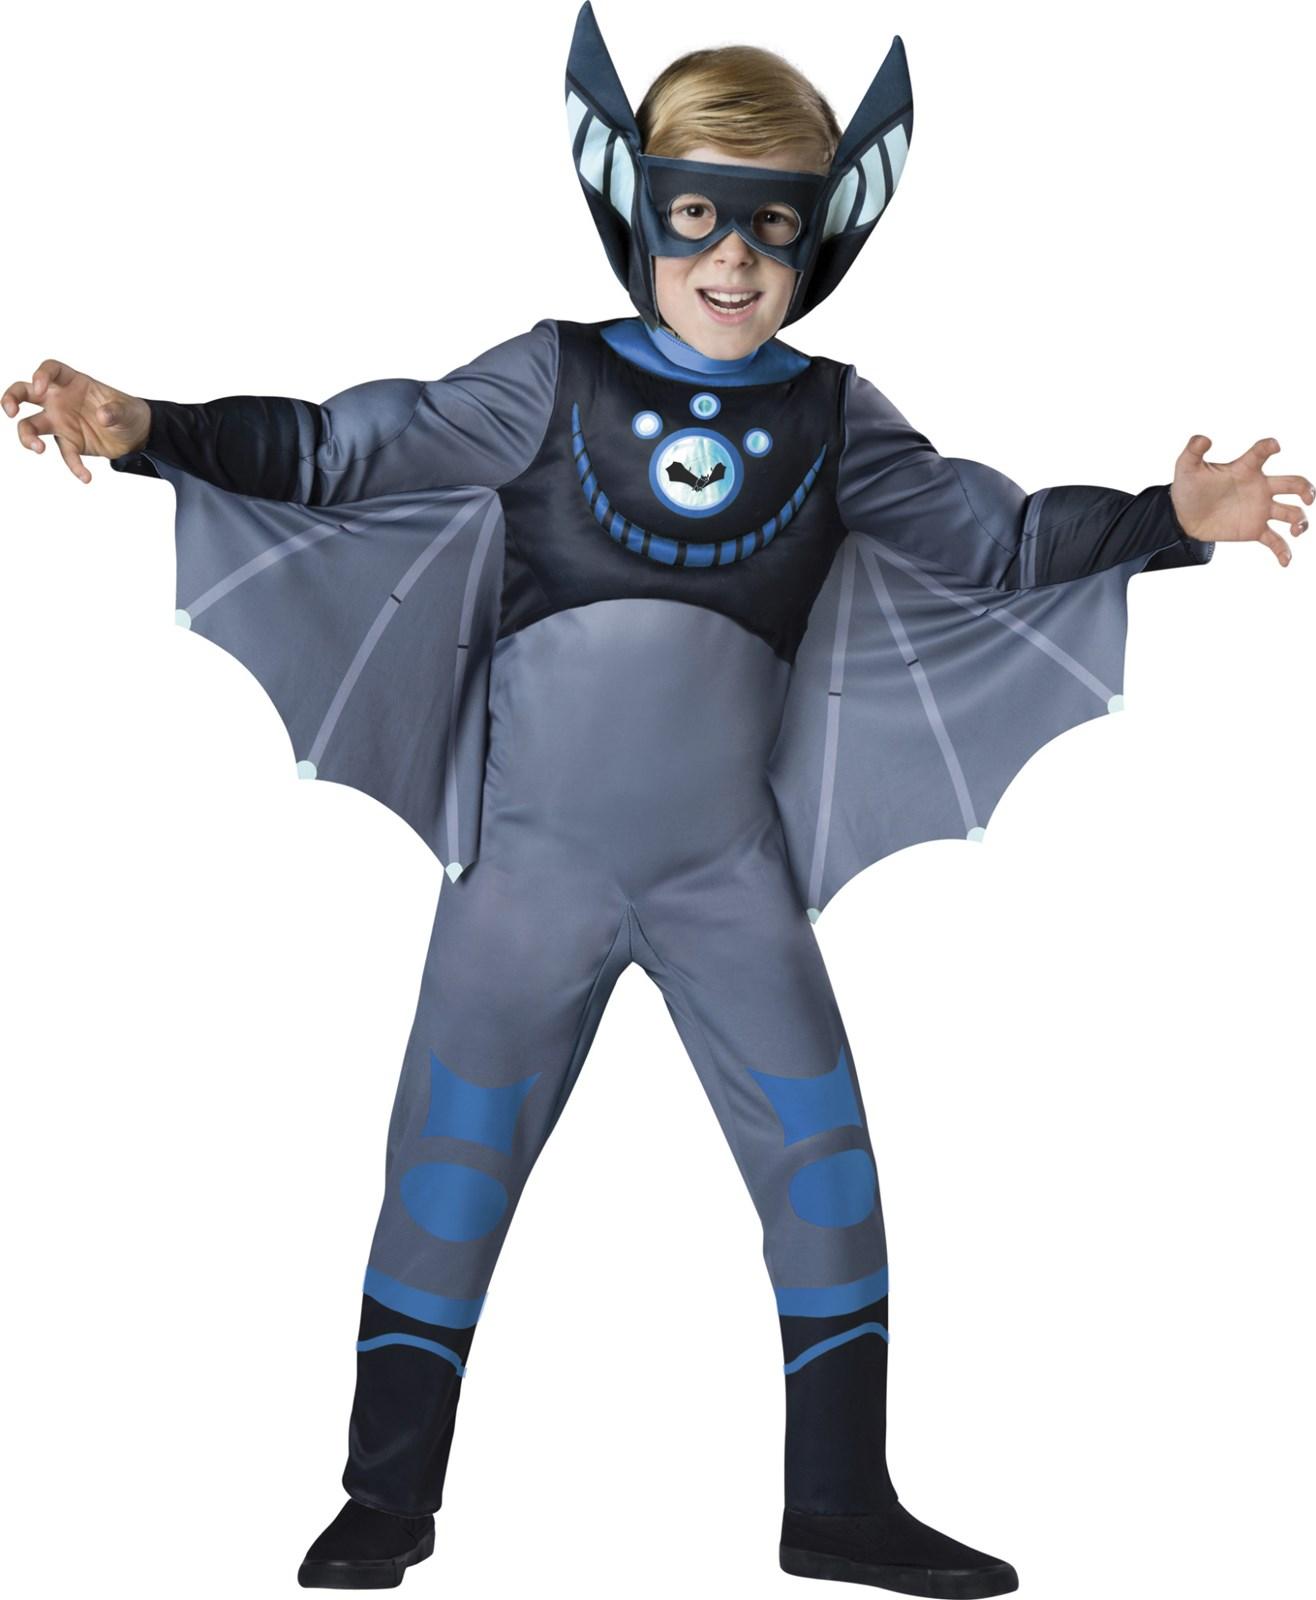 Wild Kratts Quality Blue Bat Costume For Boys